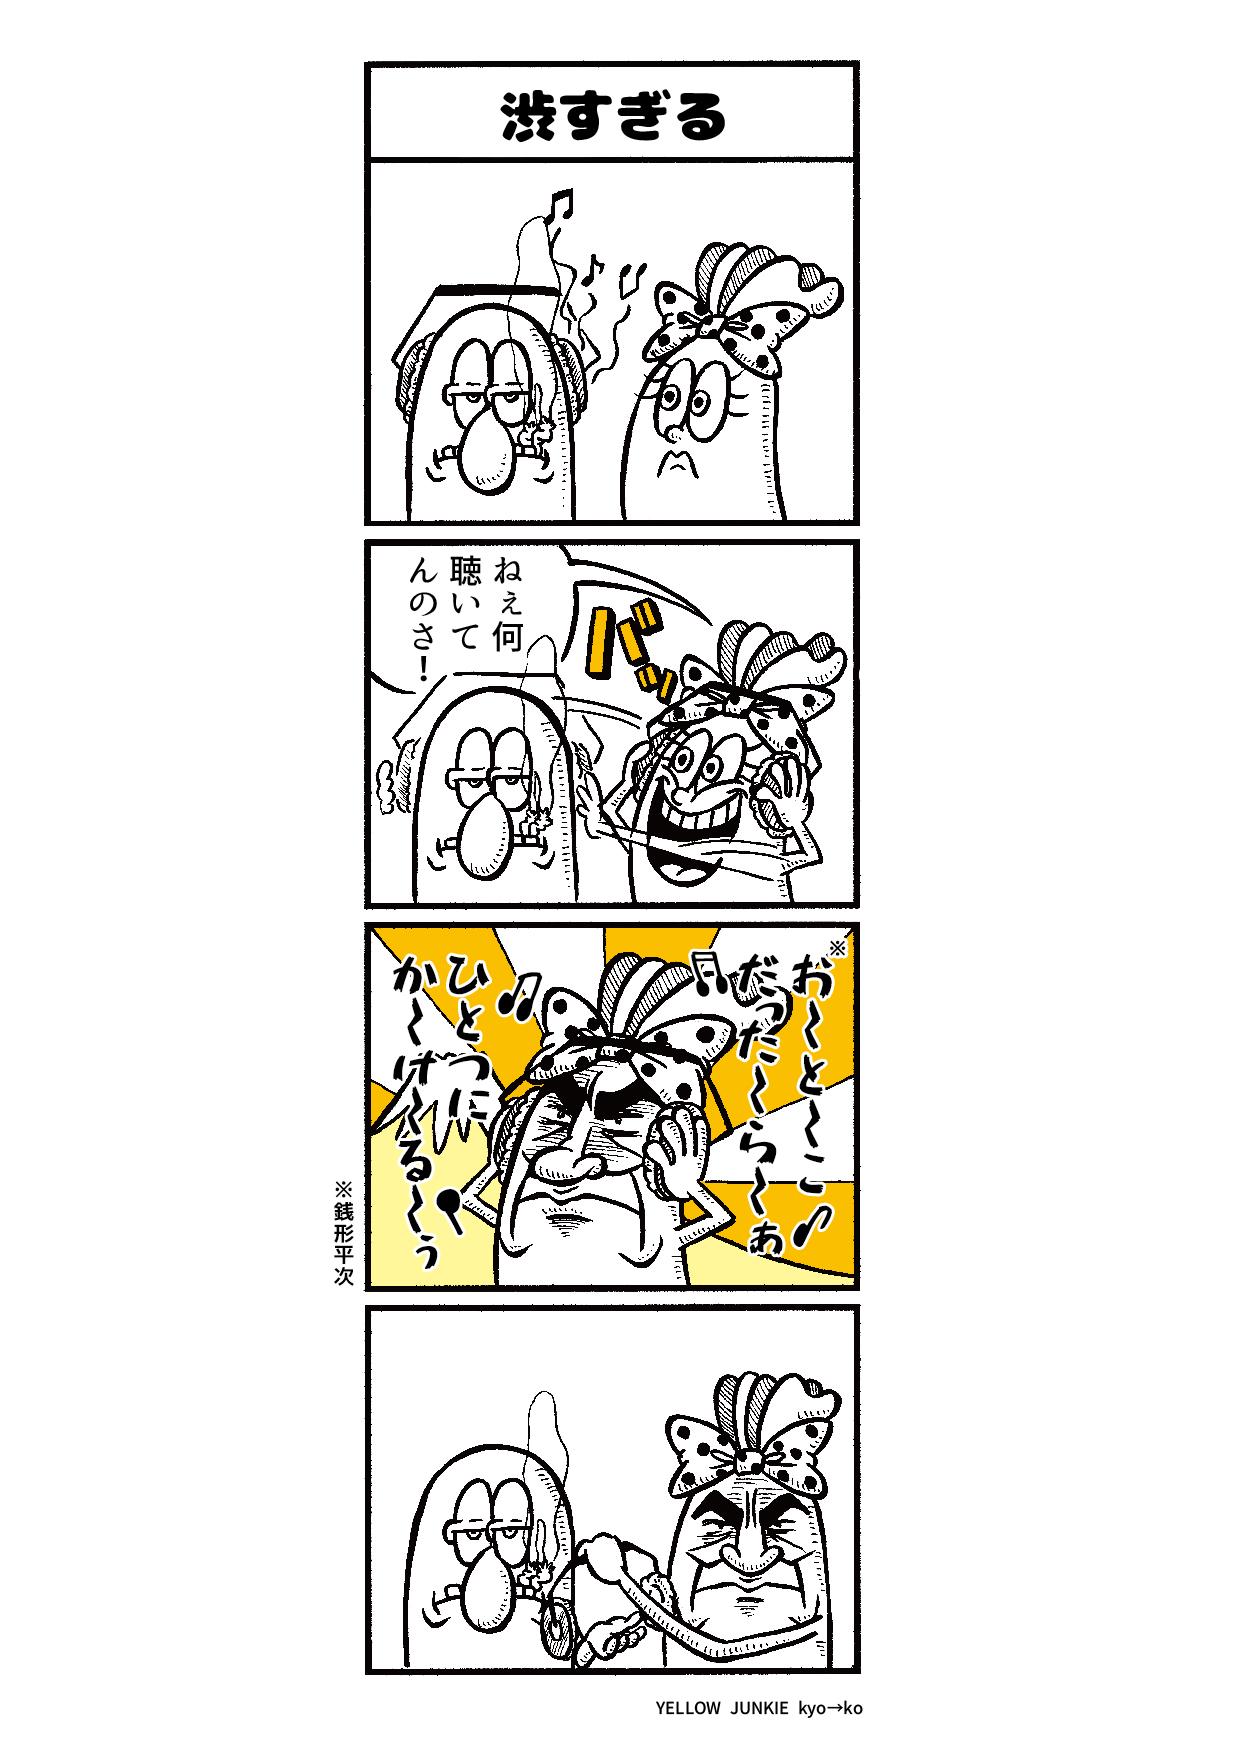 YELLOW JUNKIE「28話:渋すぎる」